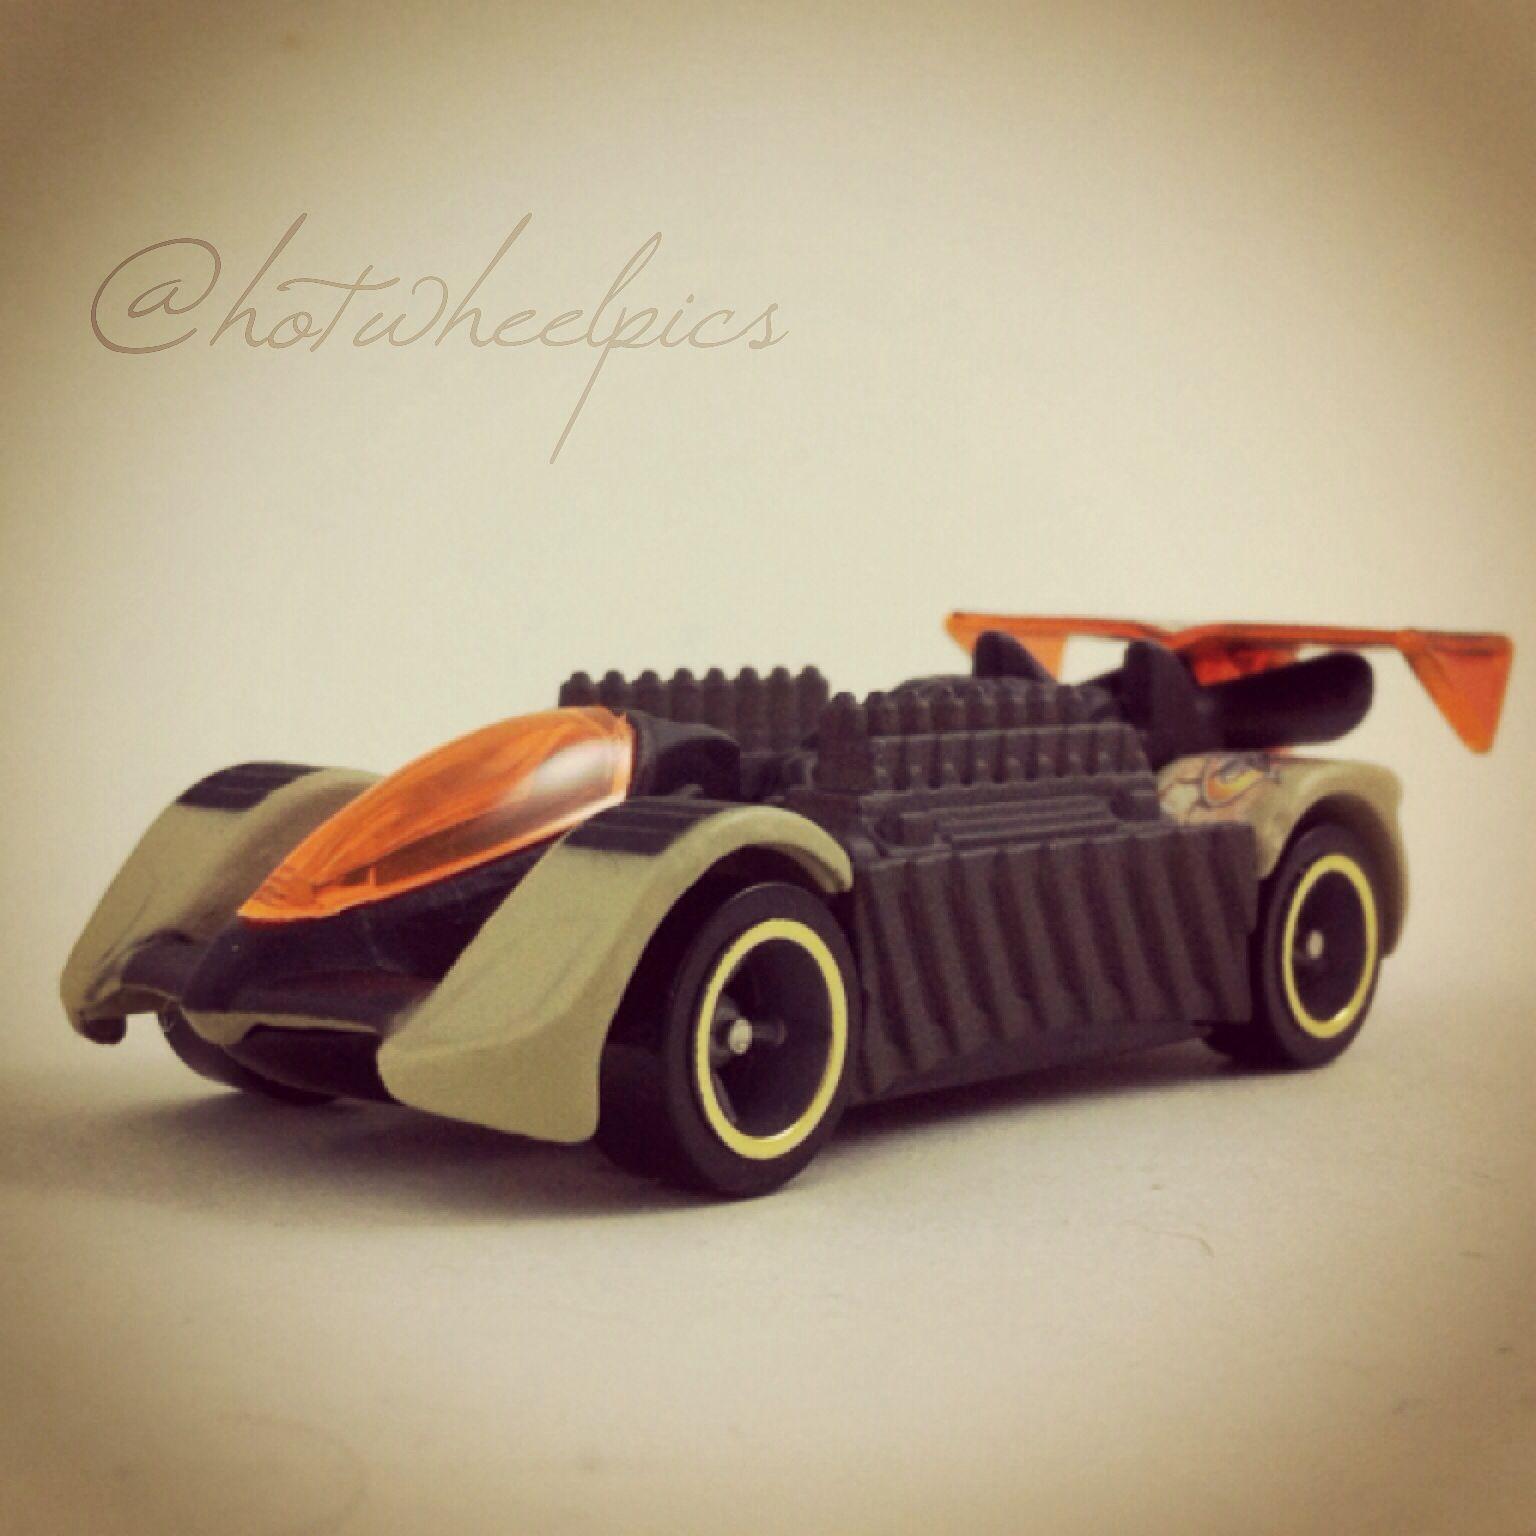 Mattel legends 1 24 1969 hot wheels twin mill concept car electronic - Krazy 8s 2003 Hot Wheels Hwy 35 World Race Dune Ratz Hotwheels